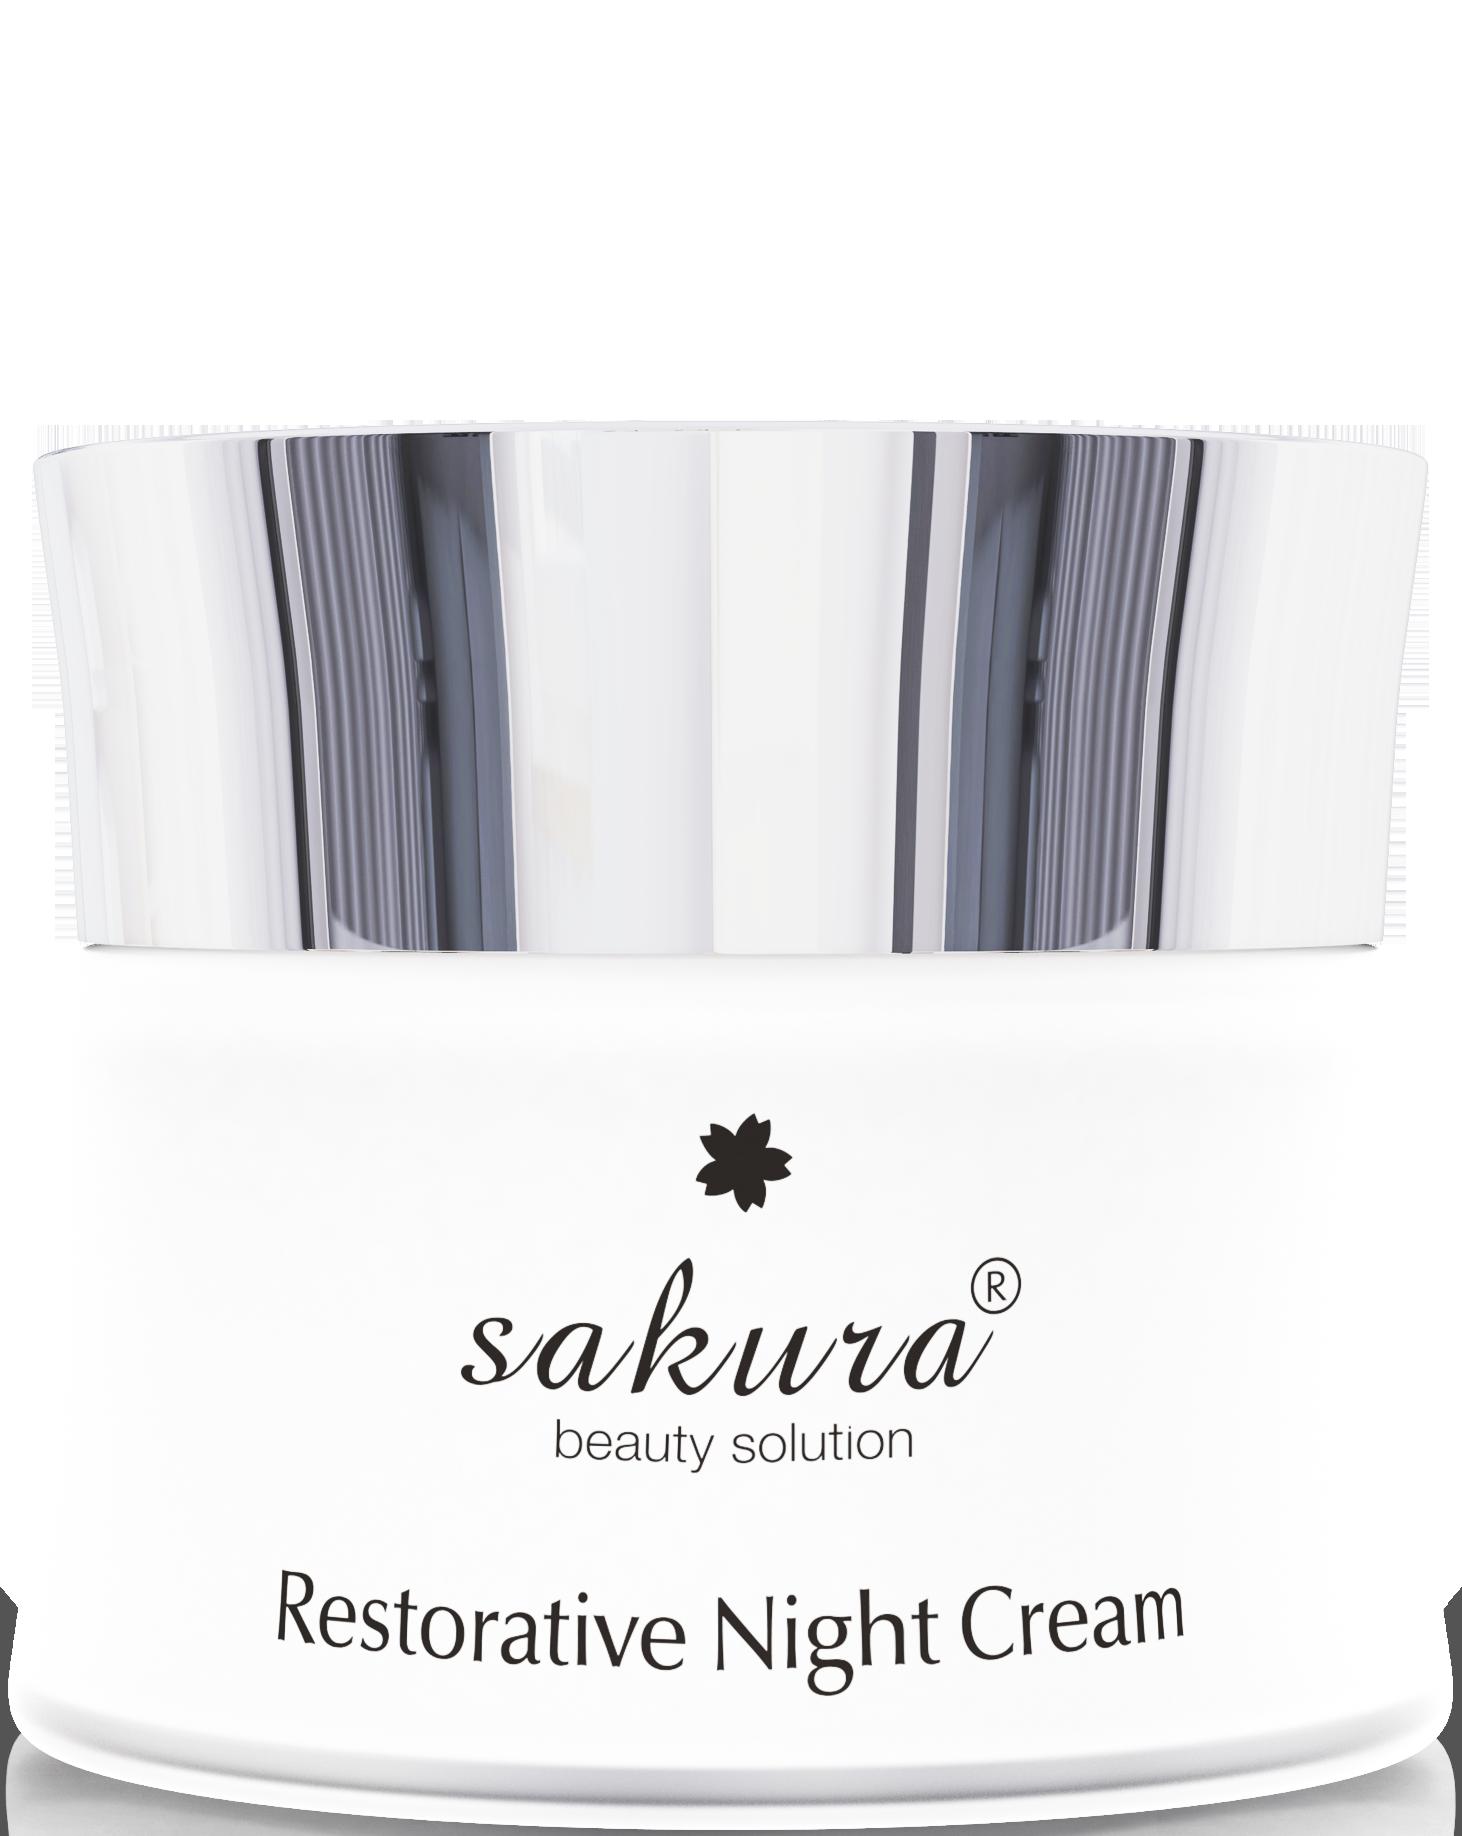 Kem dưỡng phục hồi da chống lão hoá ban đêm Sakura Restorative Night Cream